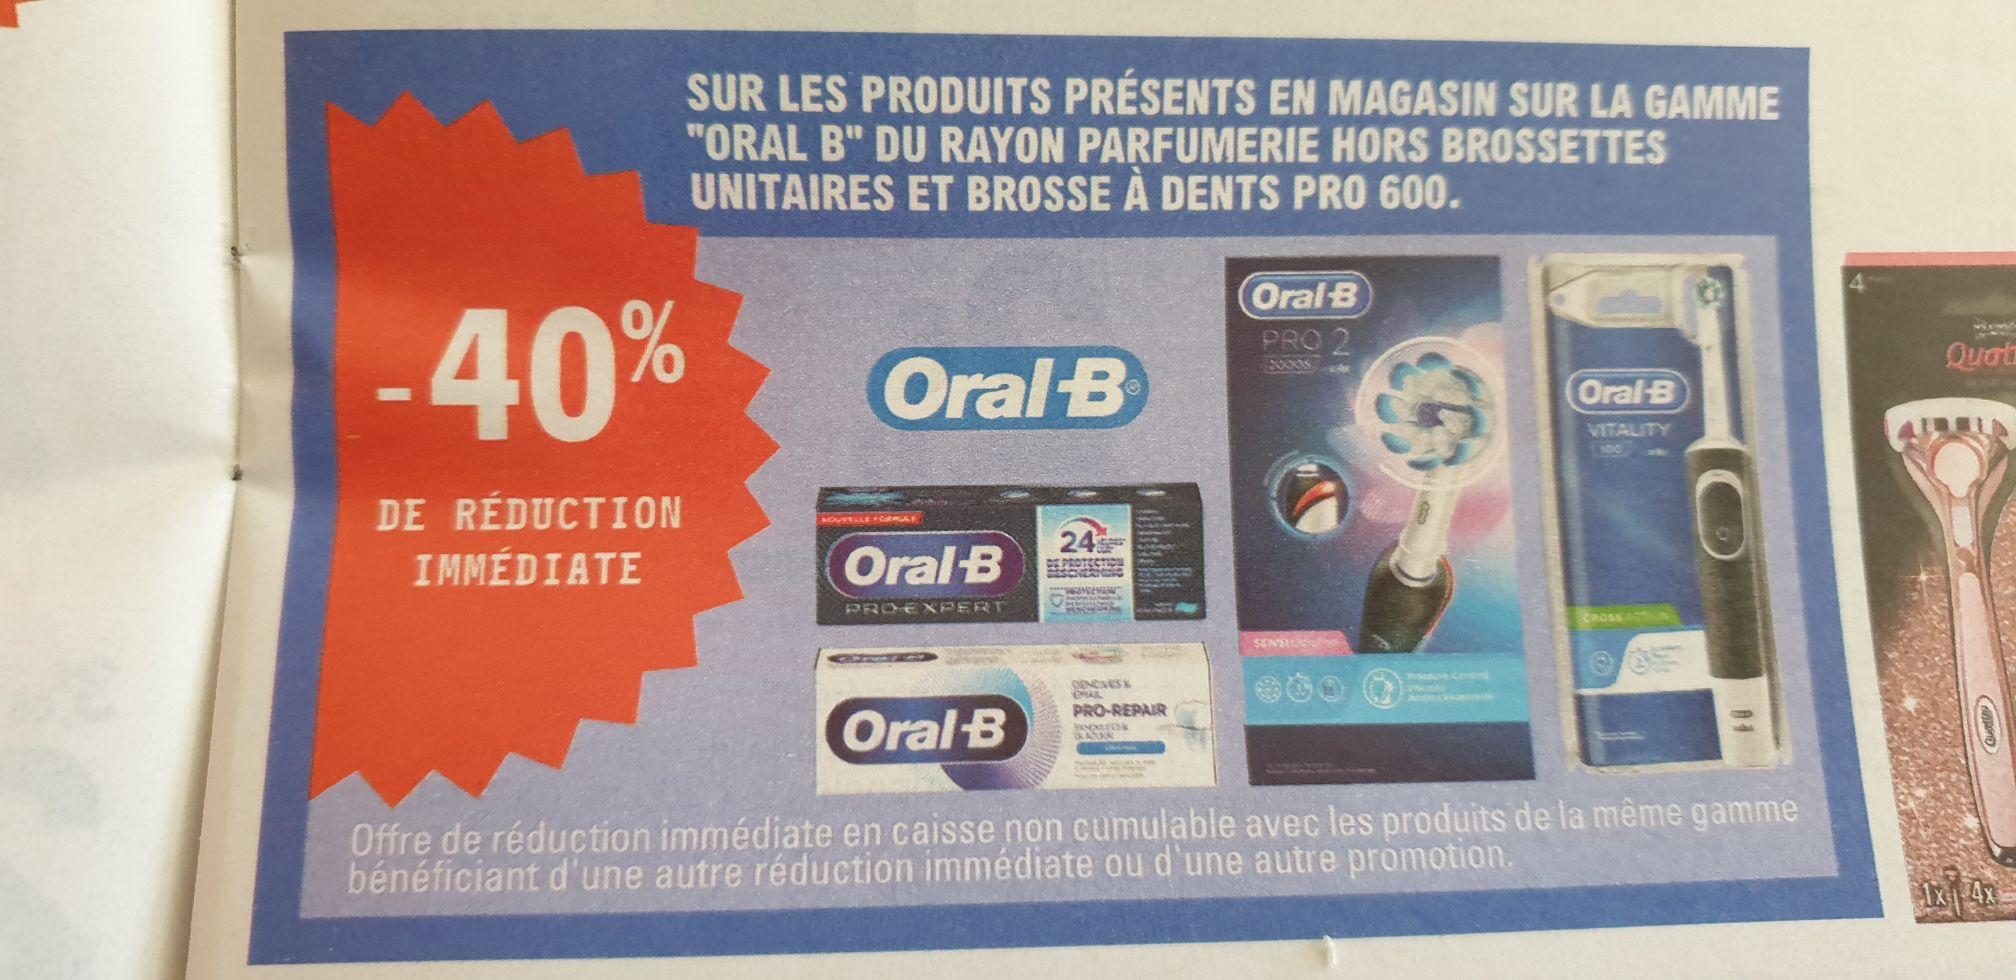 Dentifrice Oral-B Pro Expert Menthe extra fraîche - 75 ml (via Shopmium)